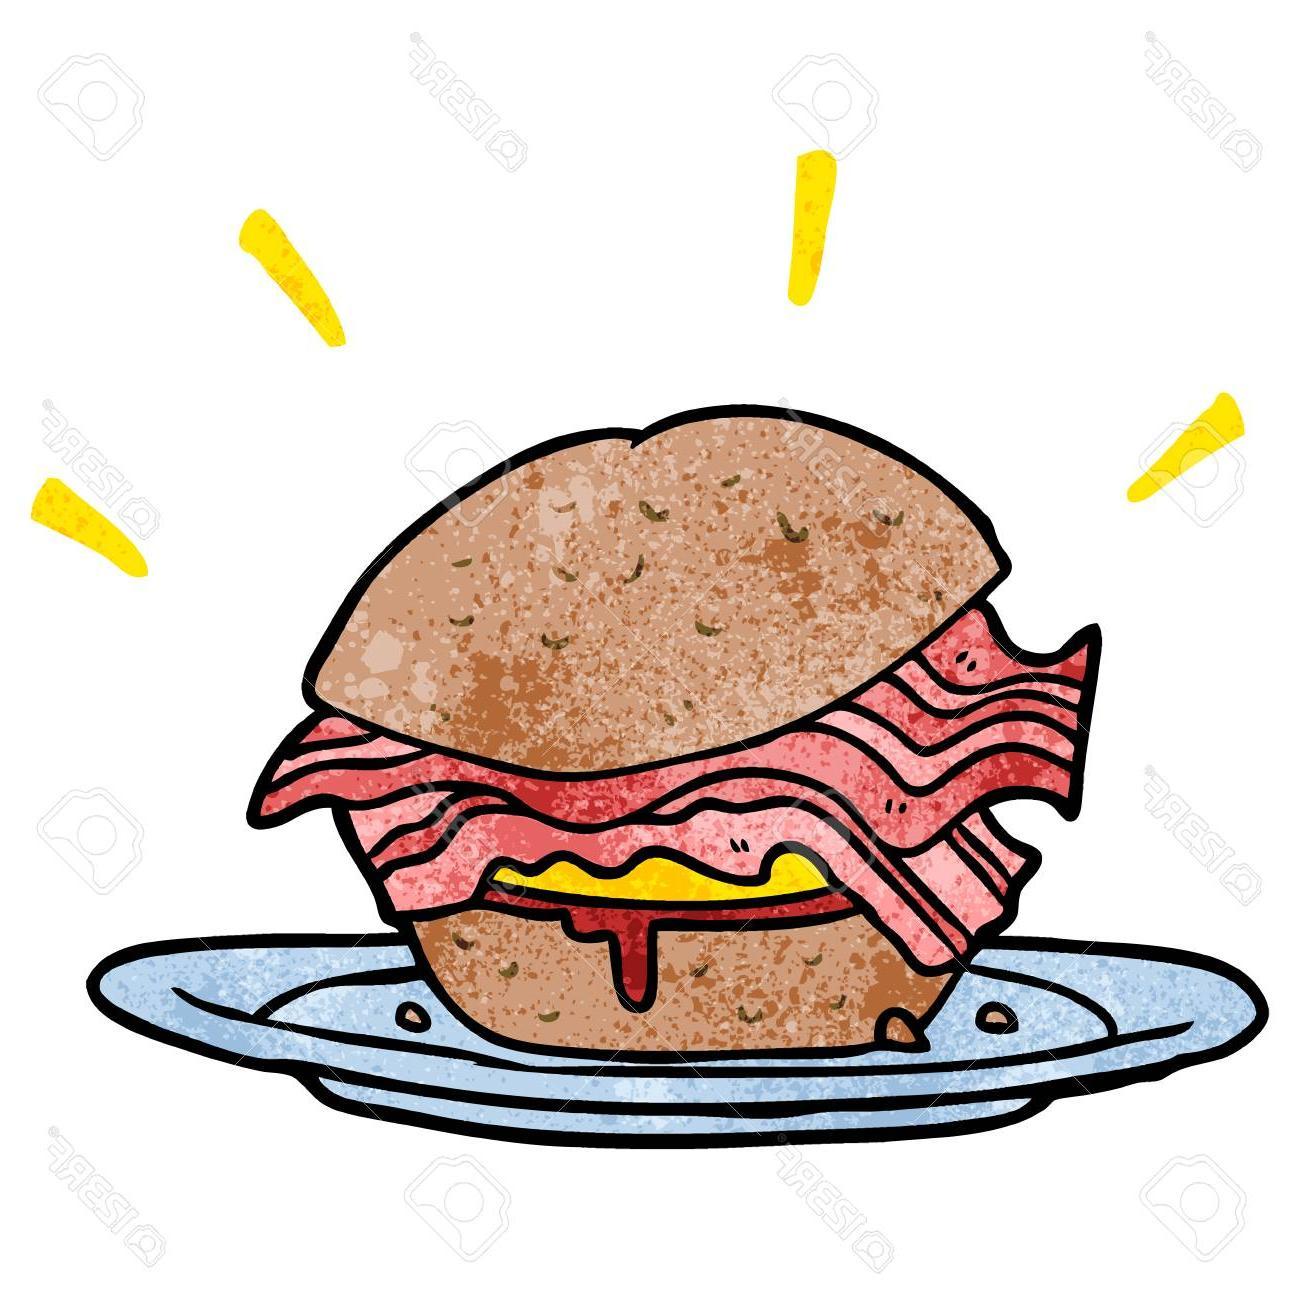 HD Breakfast Sandwich Vector Library » Free Vector Art, Images.